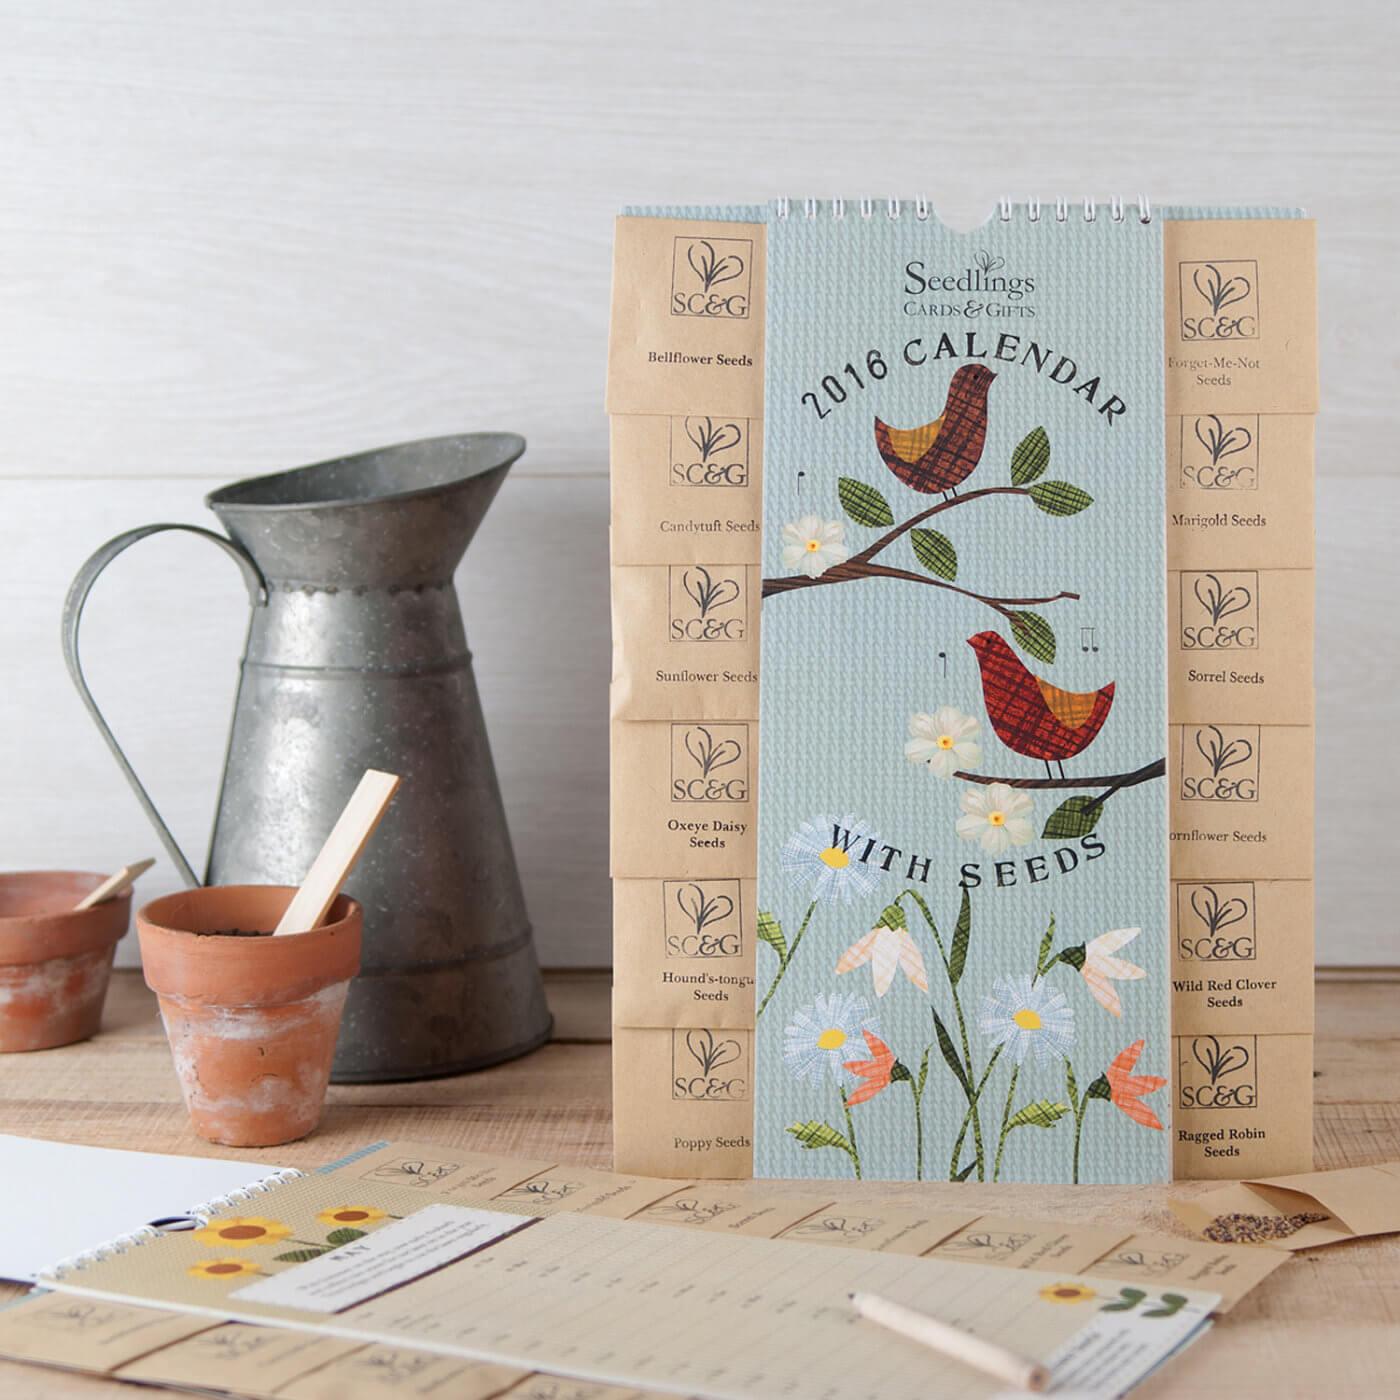 Seedlings Gifts & Cards